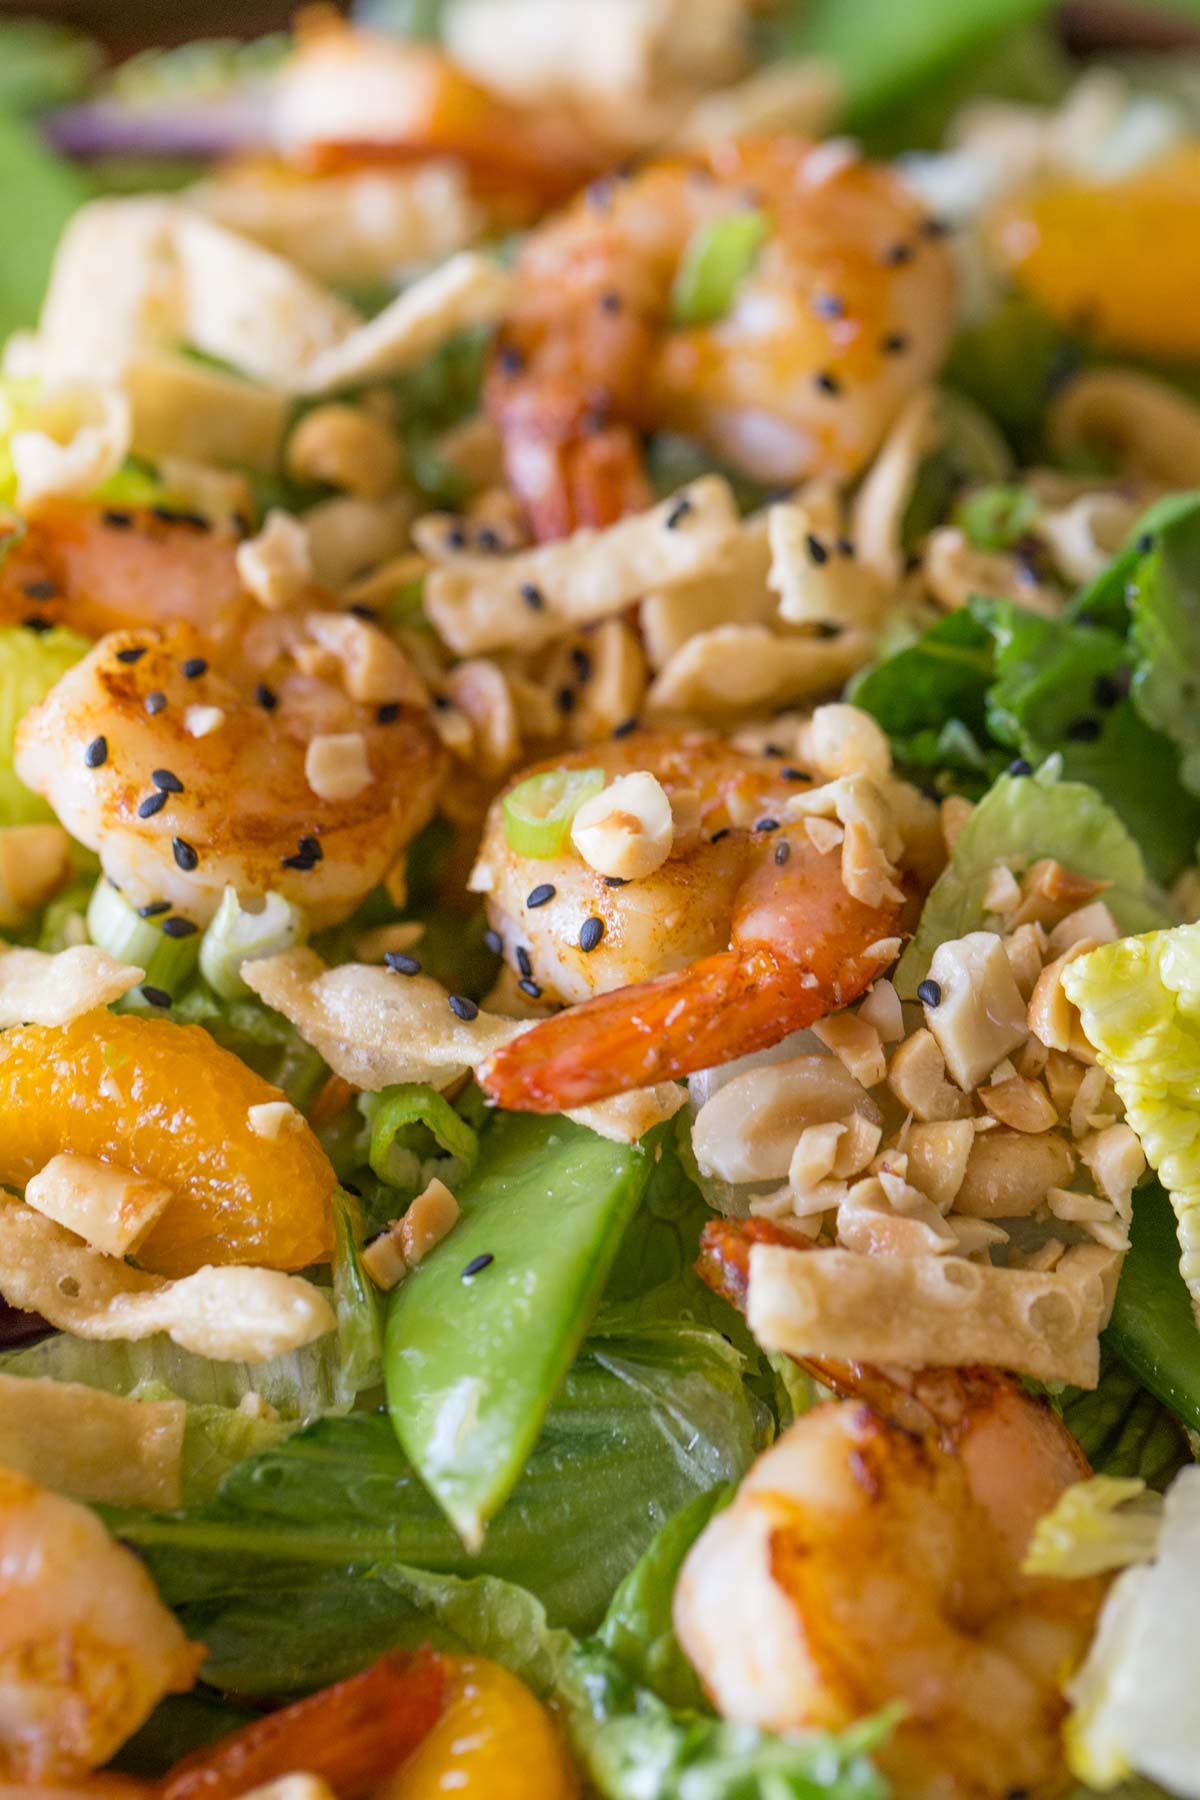 Close up of the Shrimp Salad.